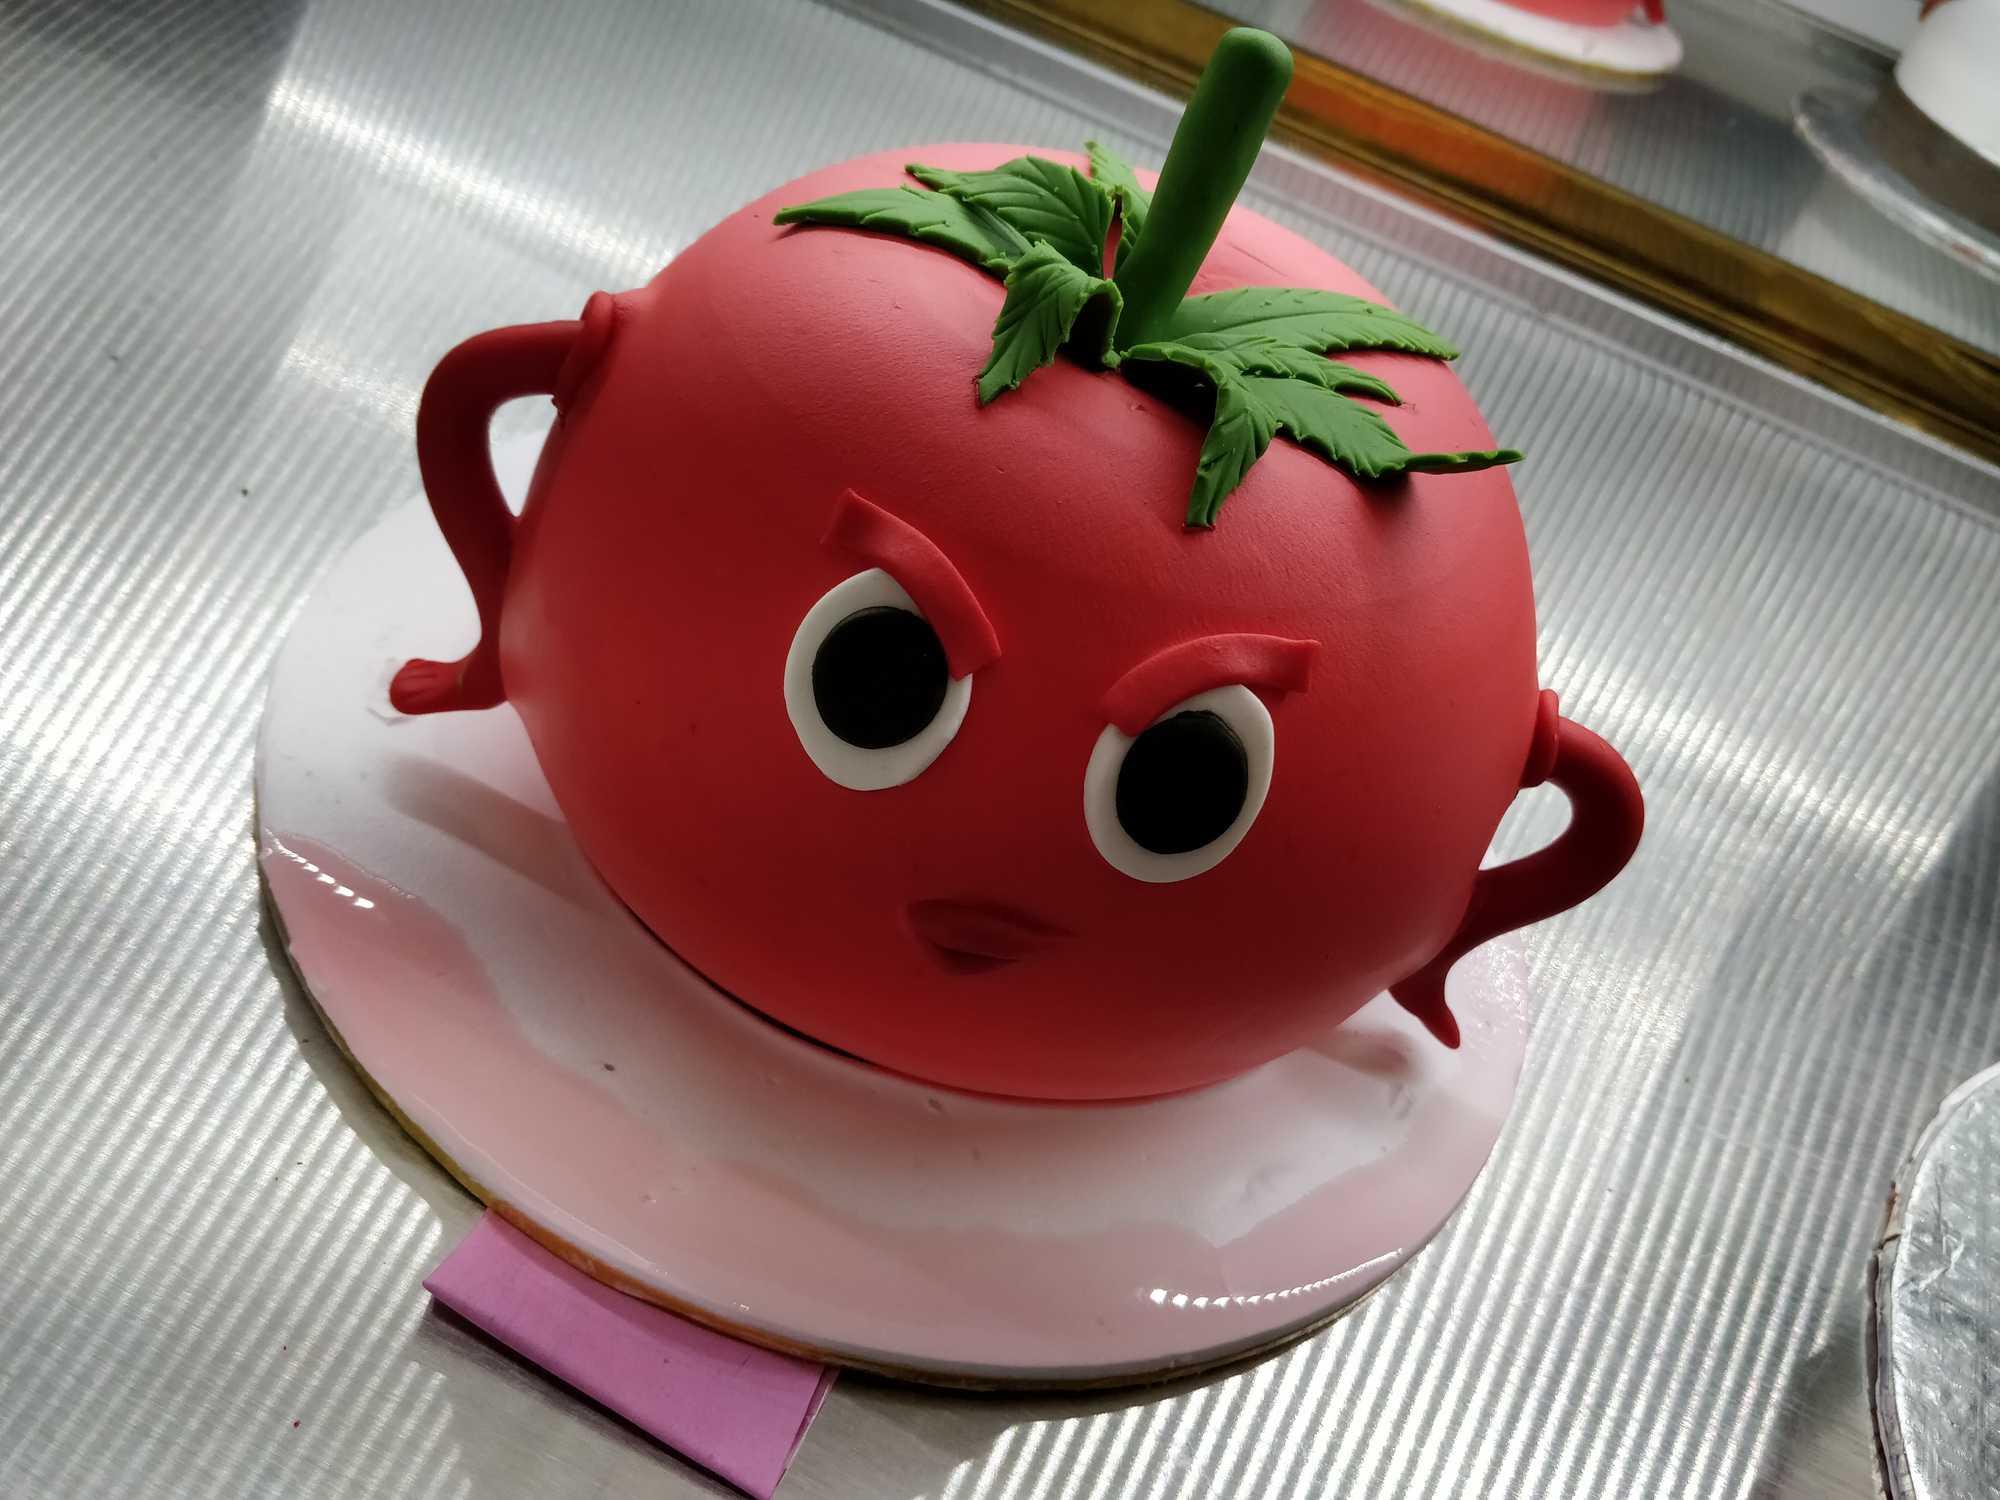 HBD027 - Tomato Cake